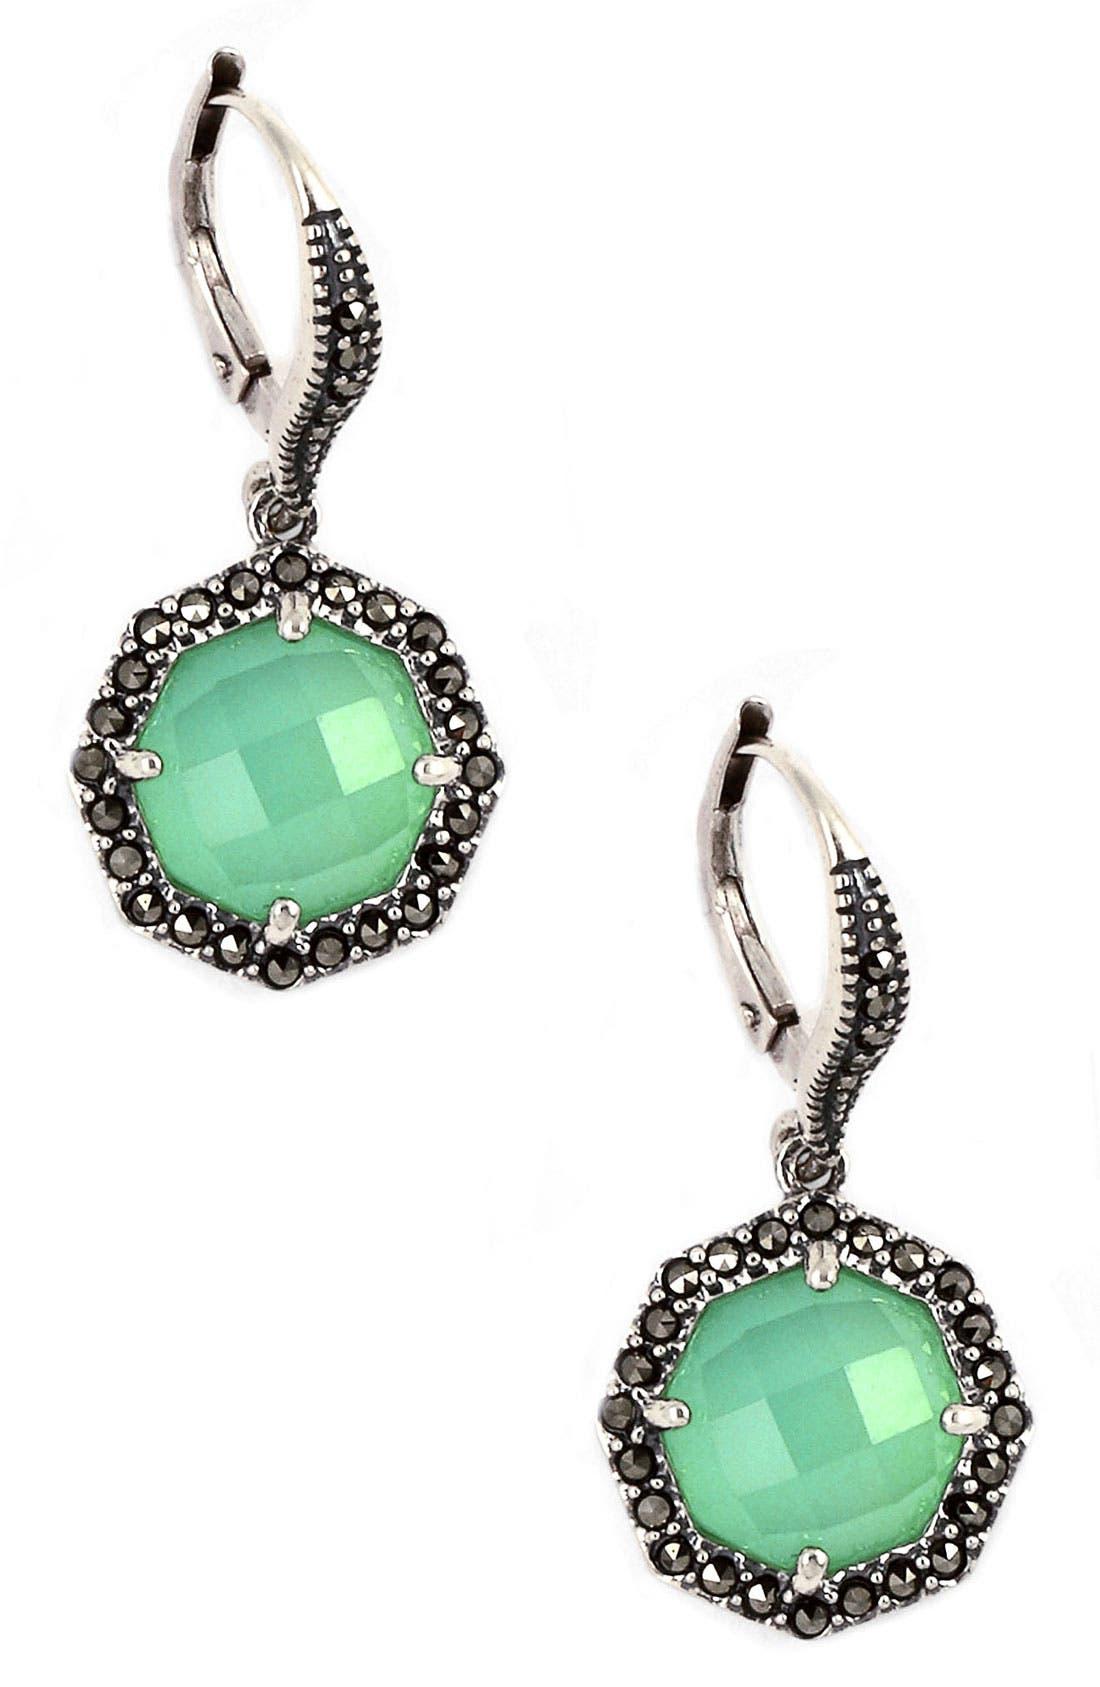 Alternate Image 1 Selected - Judith Jack 'Maldives' Small Stone Drop Earrings